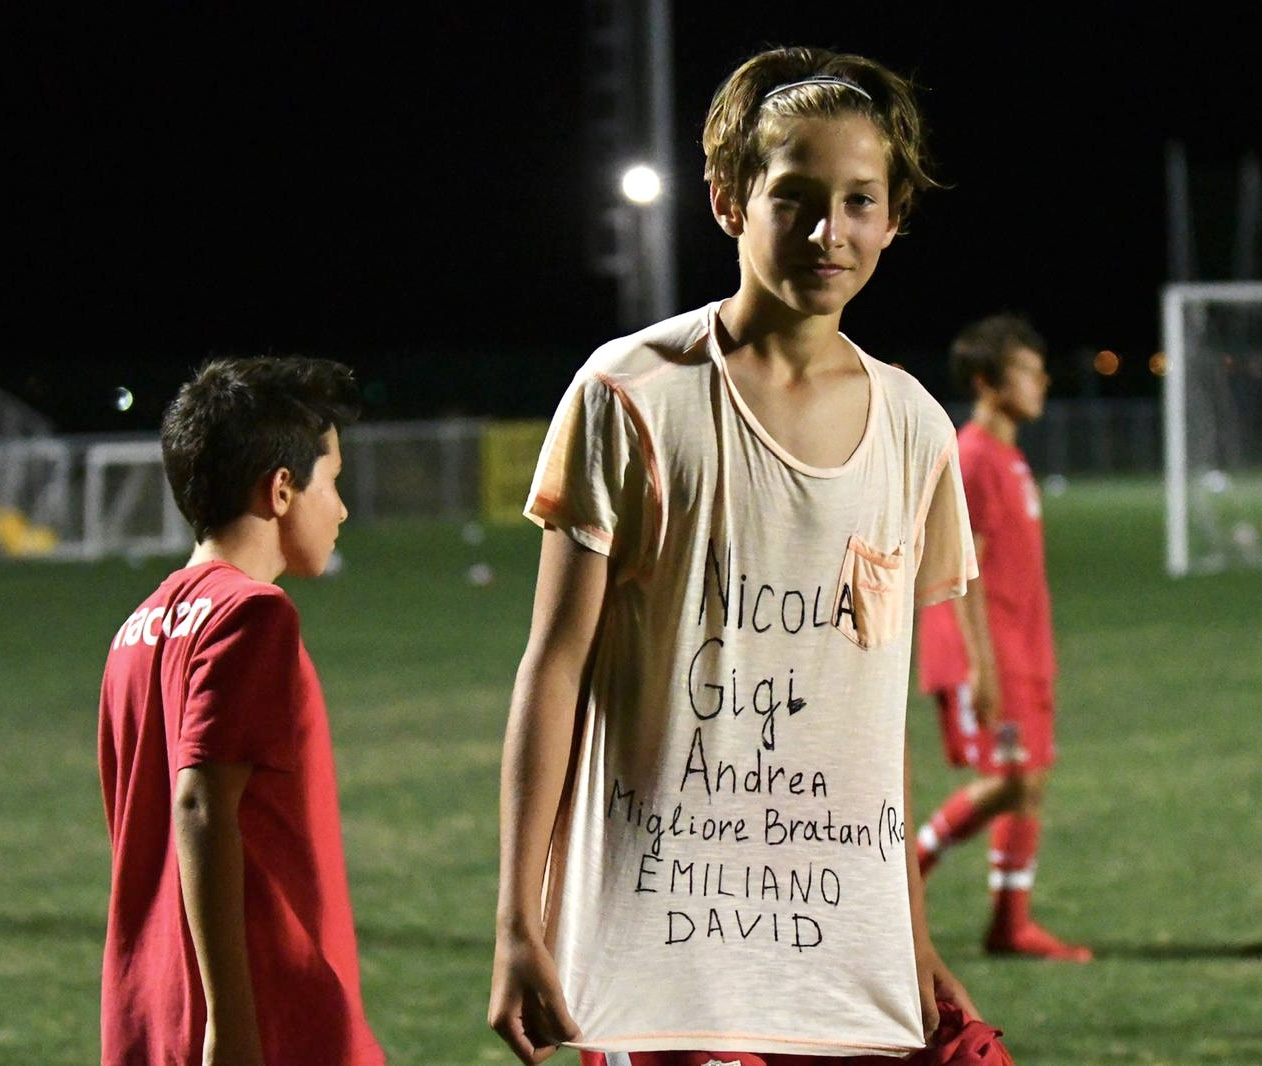 grosseto calcio summer camp torneo estivo roselle